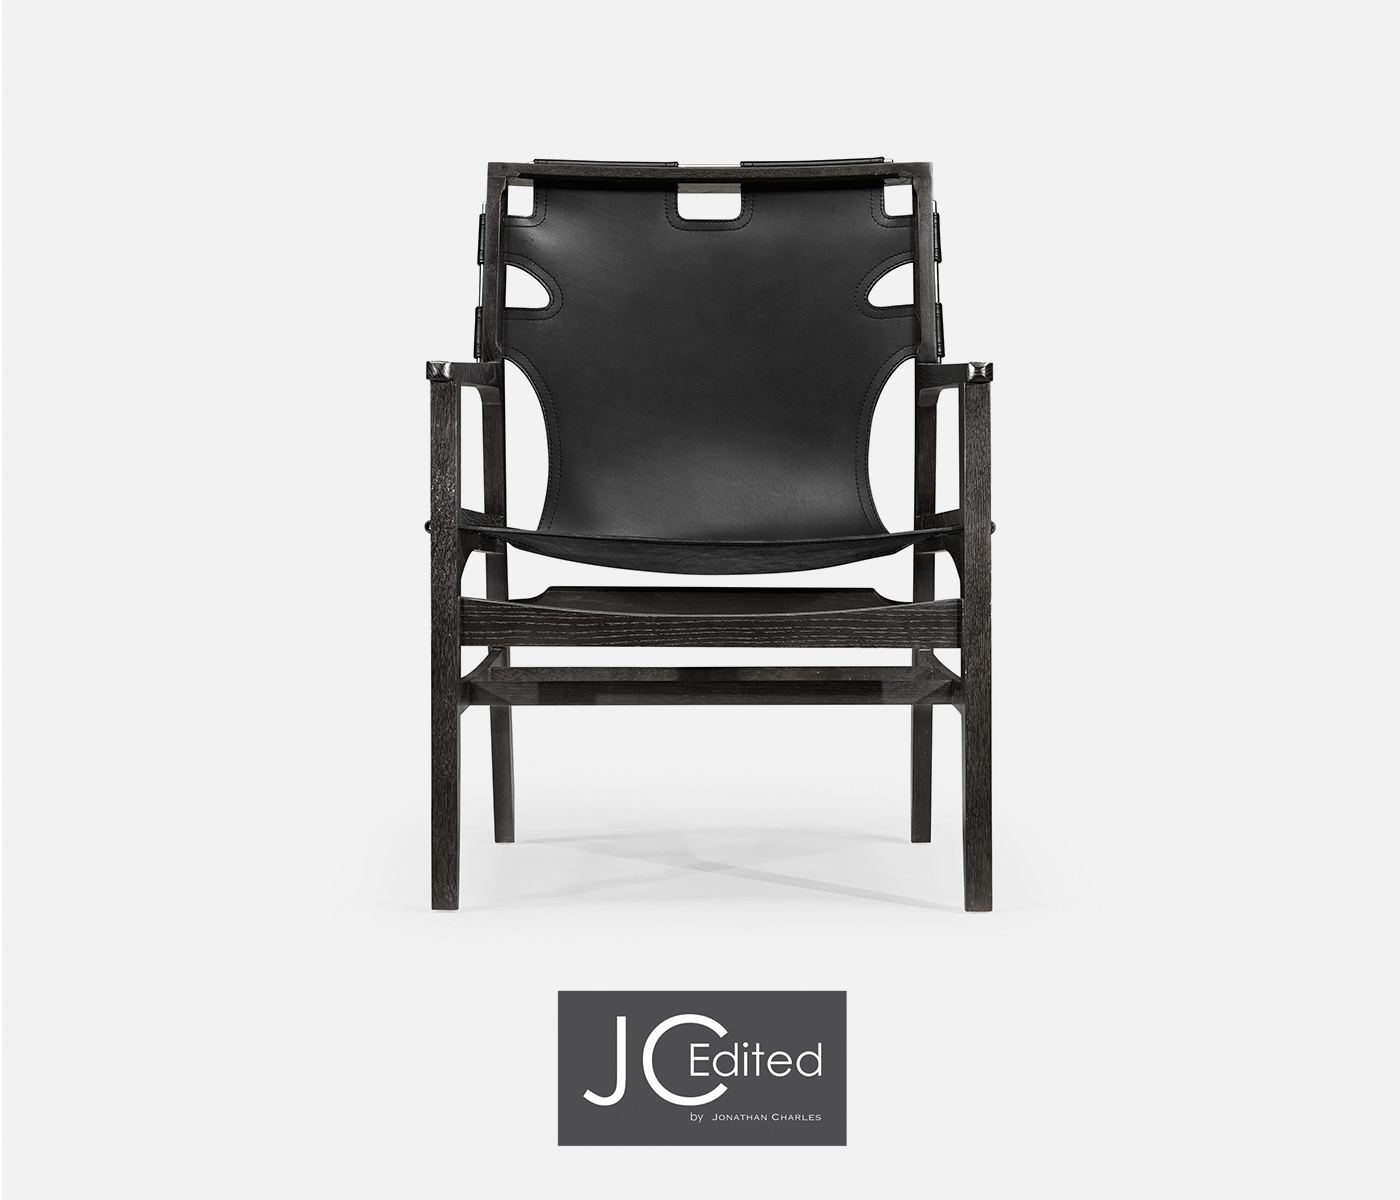 Marvelous Midcentury Style Slung Black Leather Black Mocha Oak Easy Inzonedesignstudio Interior Chair Design Inzonedesignstudiocom